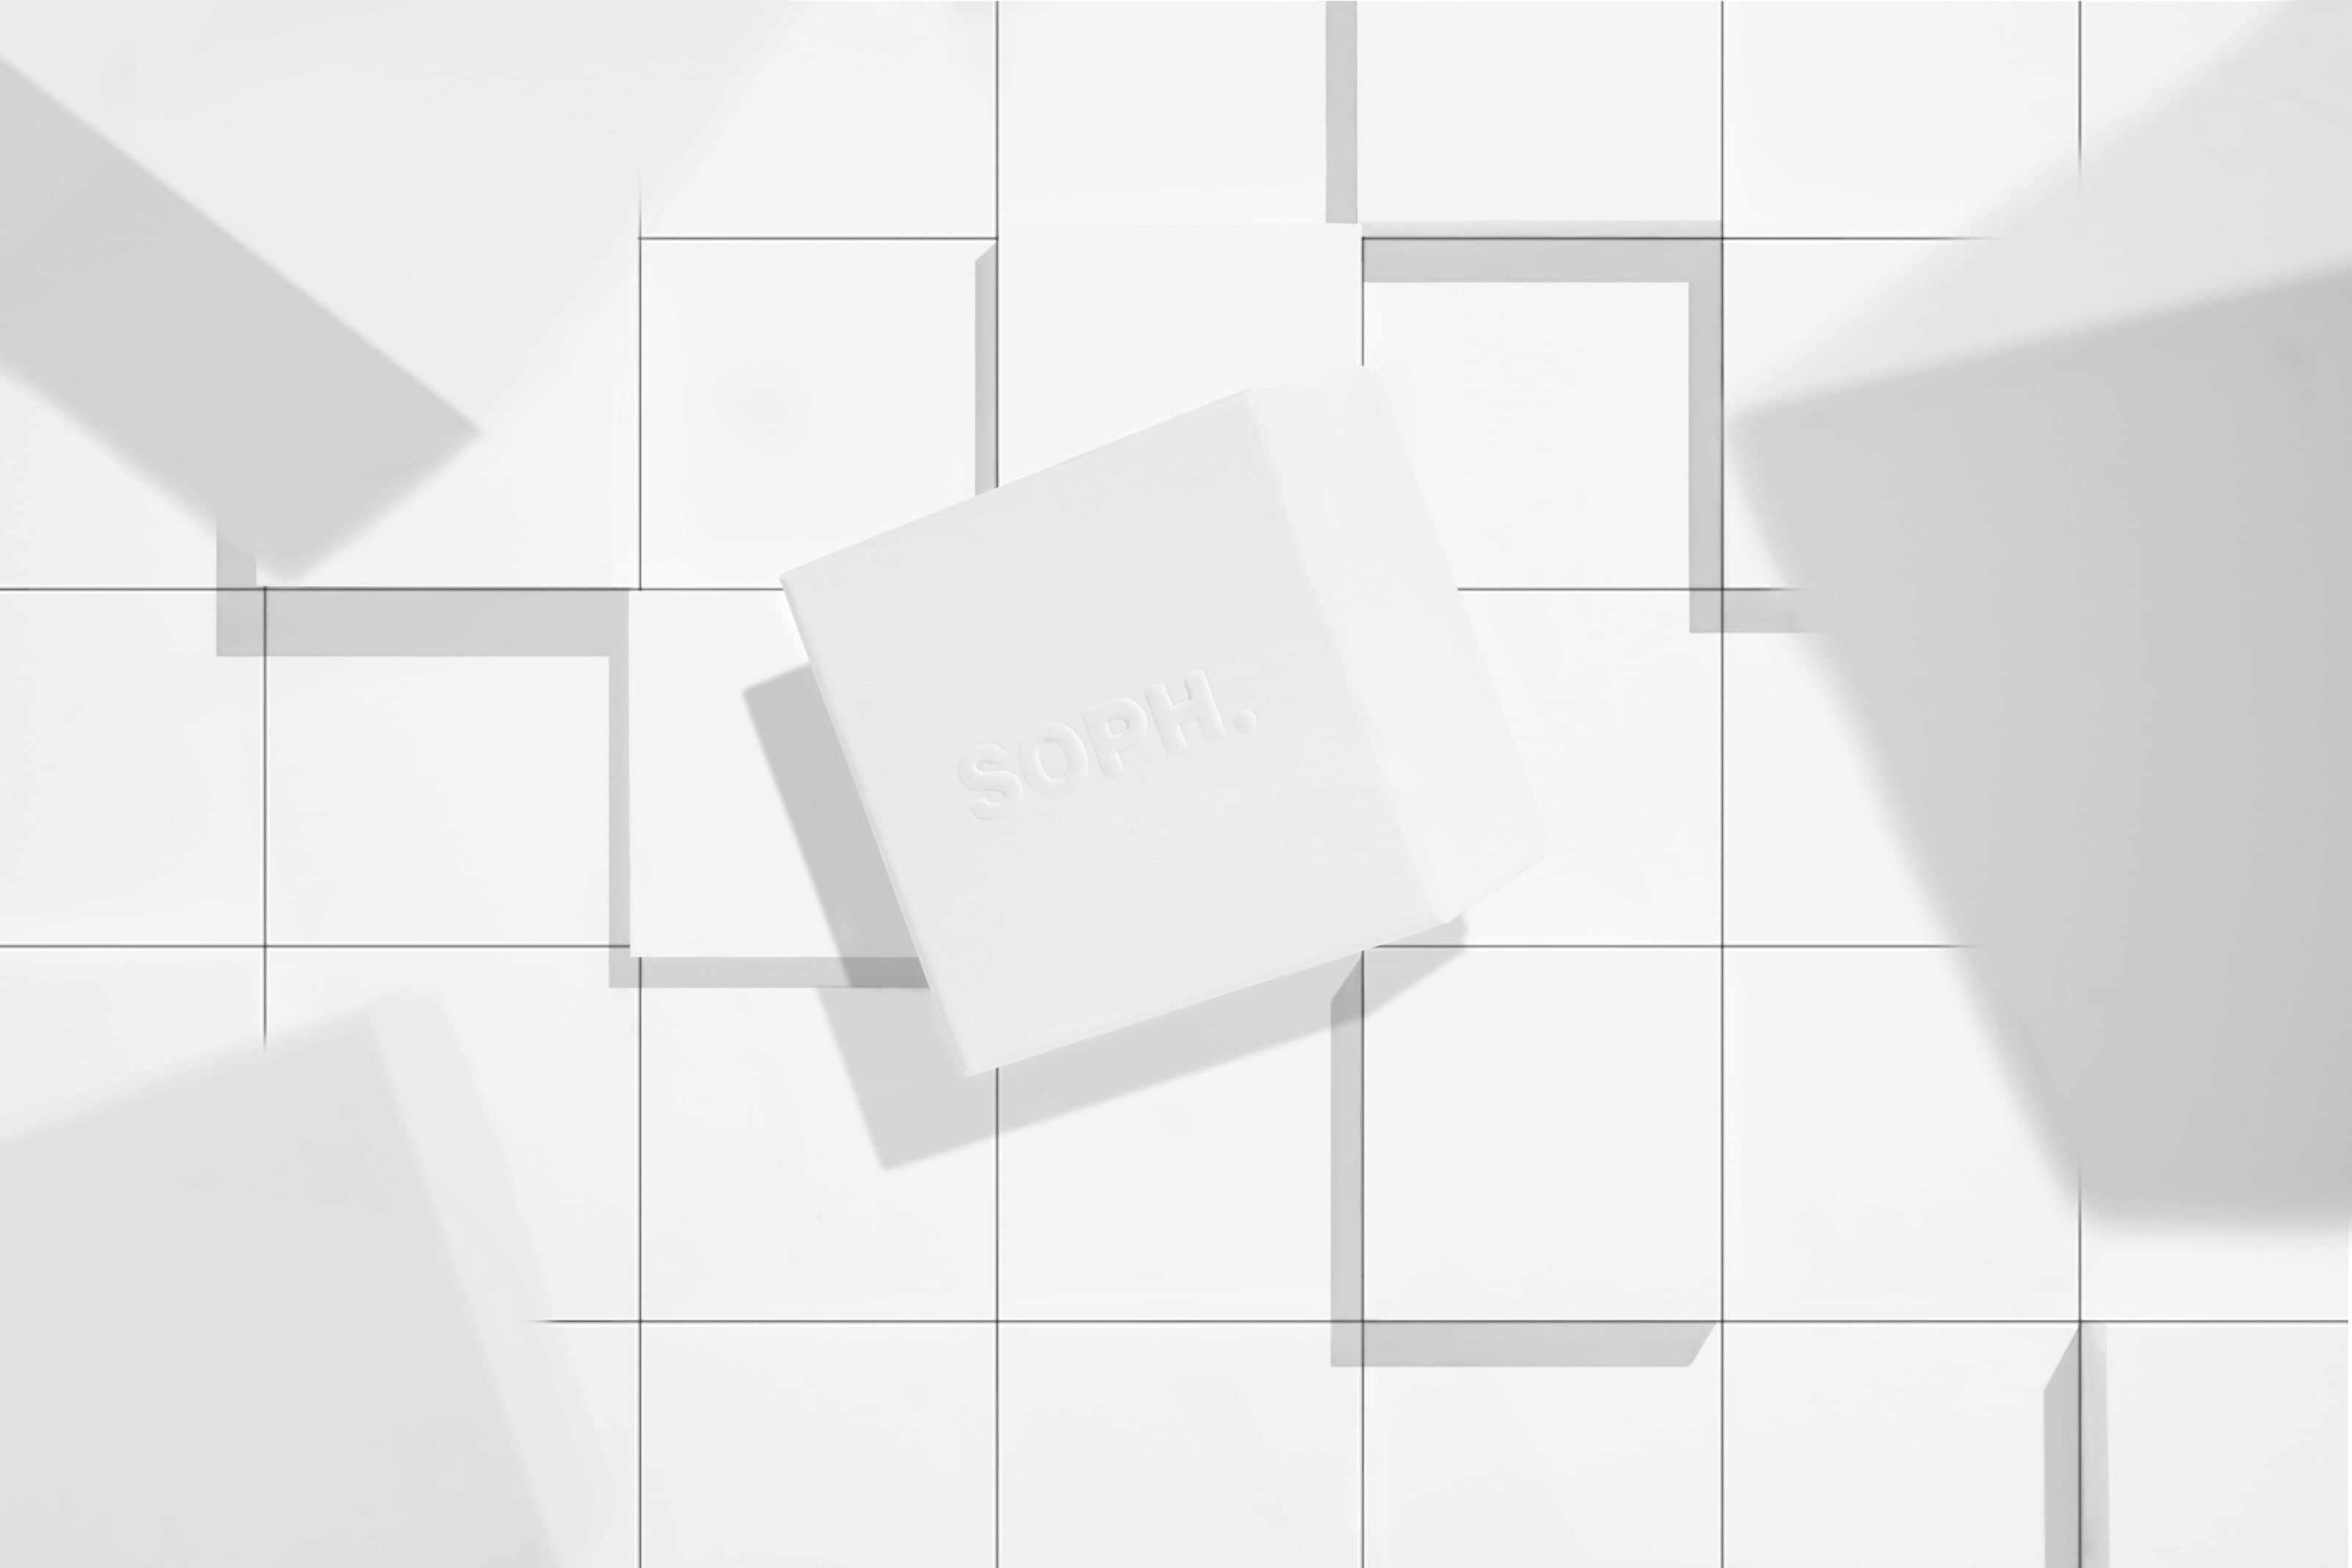 Discreet embossed SOPH. branding on the END. x SOPH. x Timex MK1 watch box.